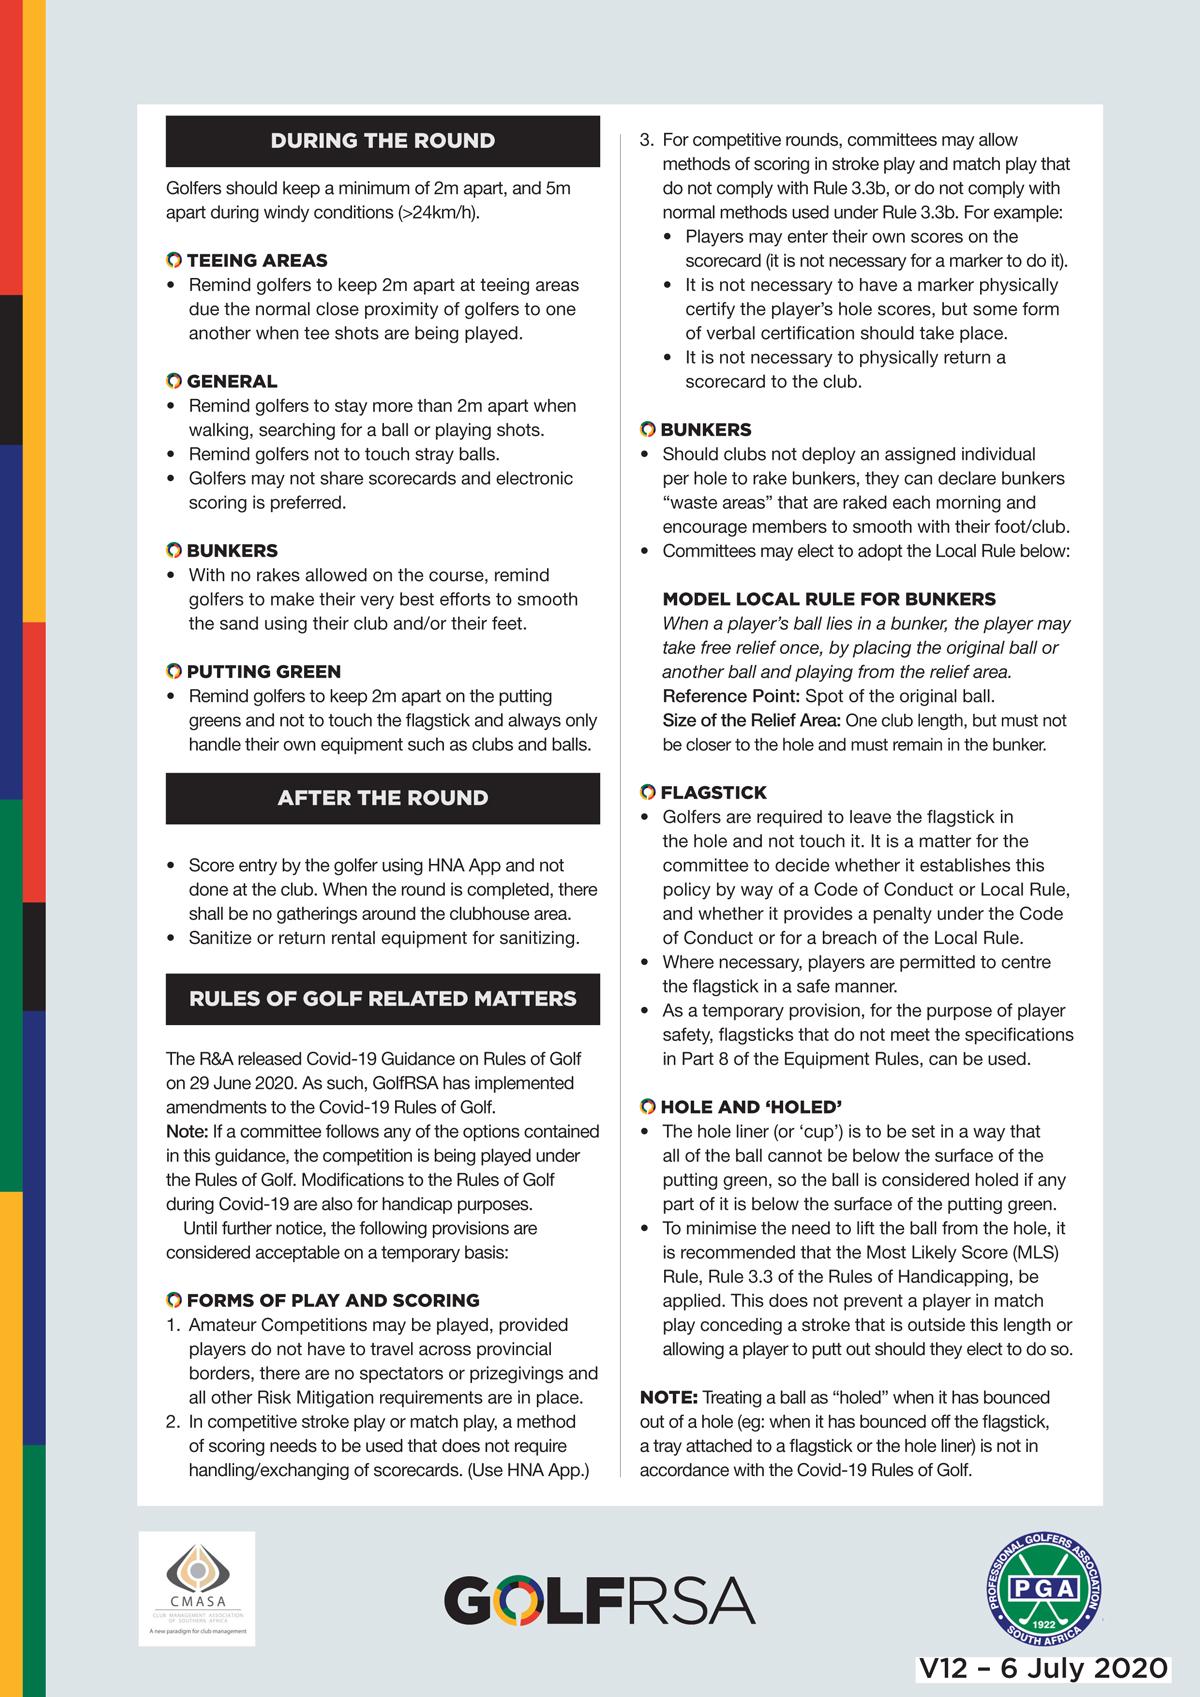 GolfRSA-Good-Practice-Guidelines-V12-2